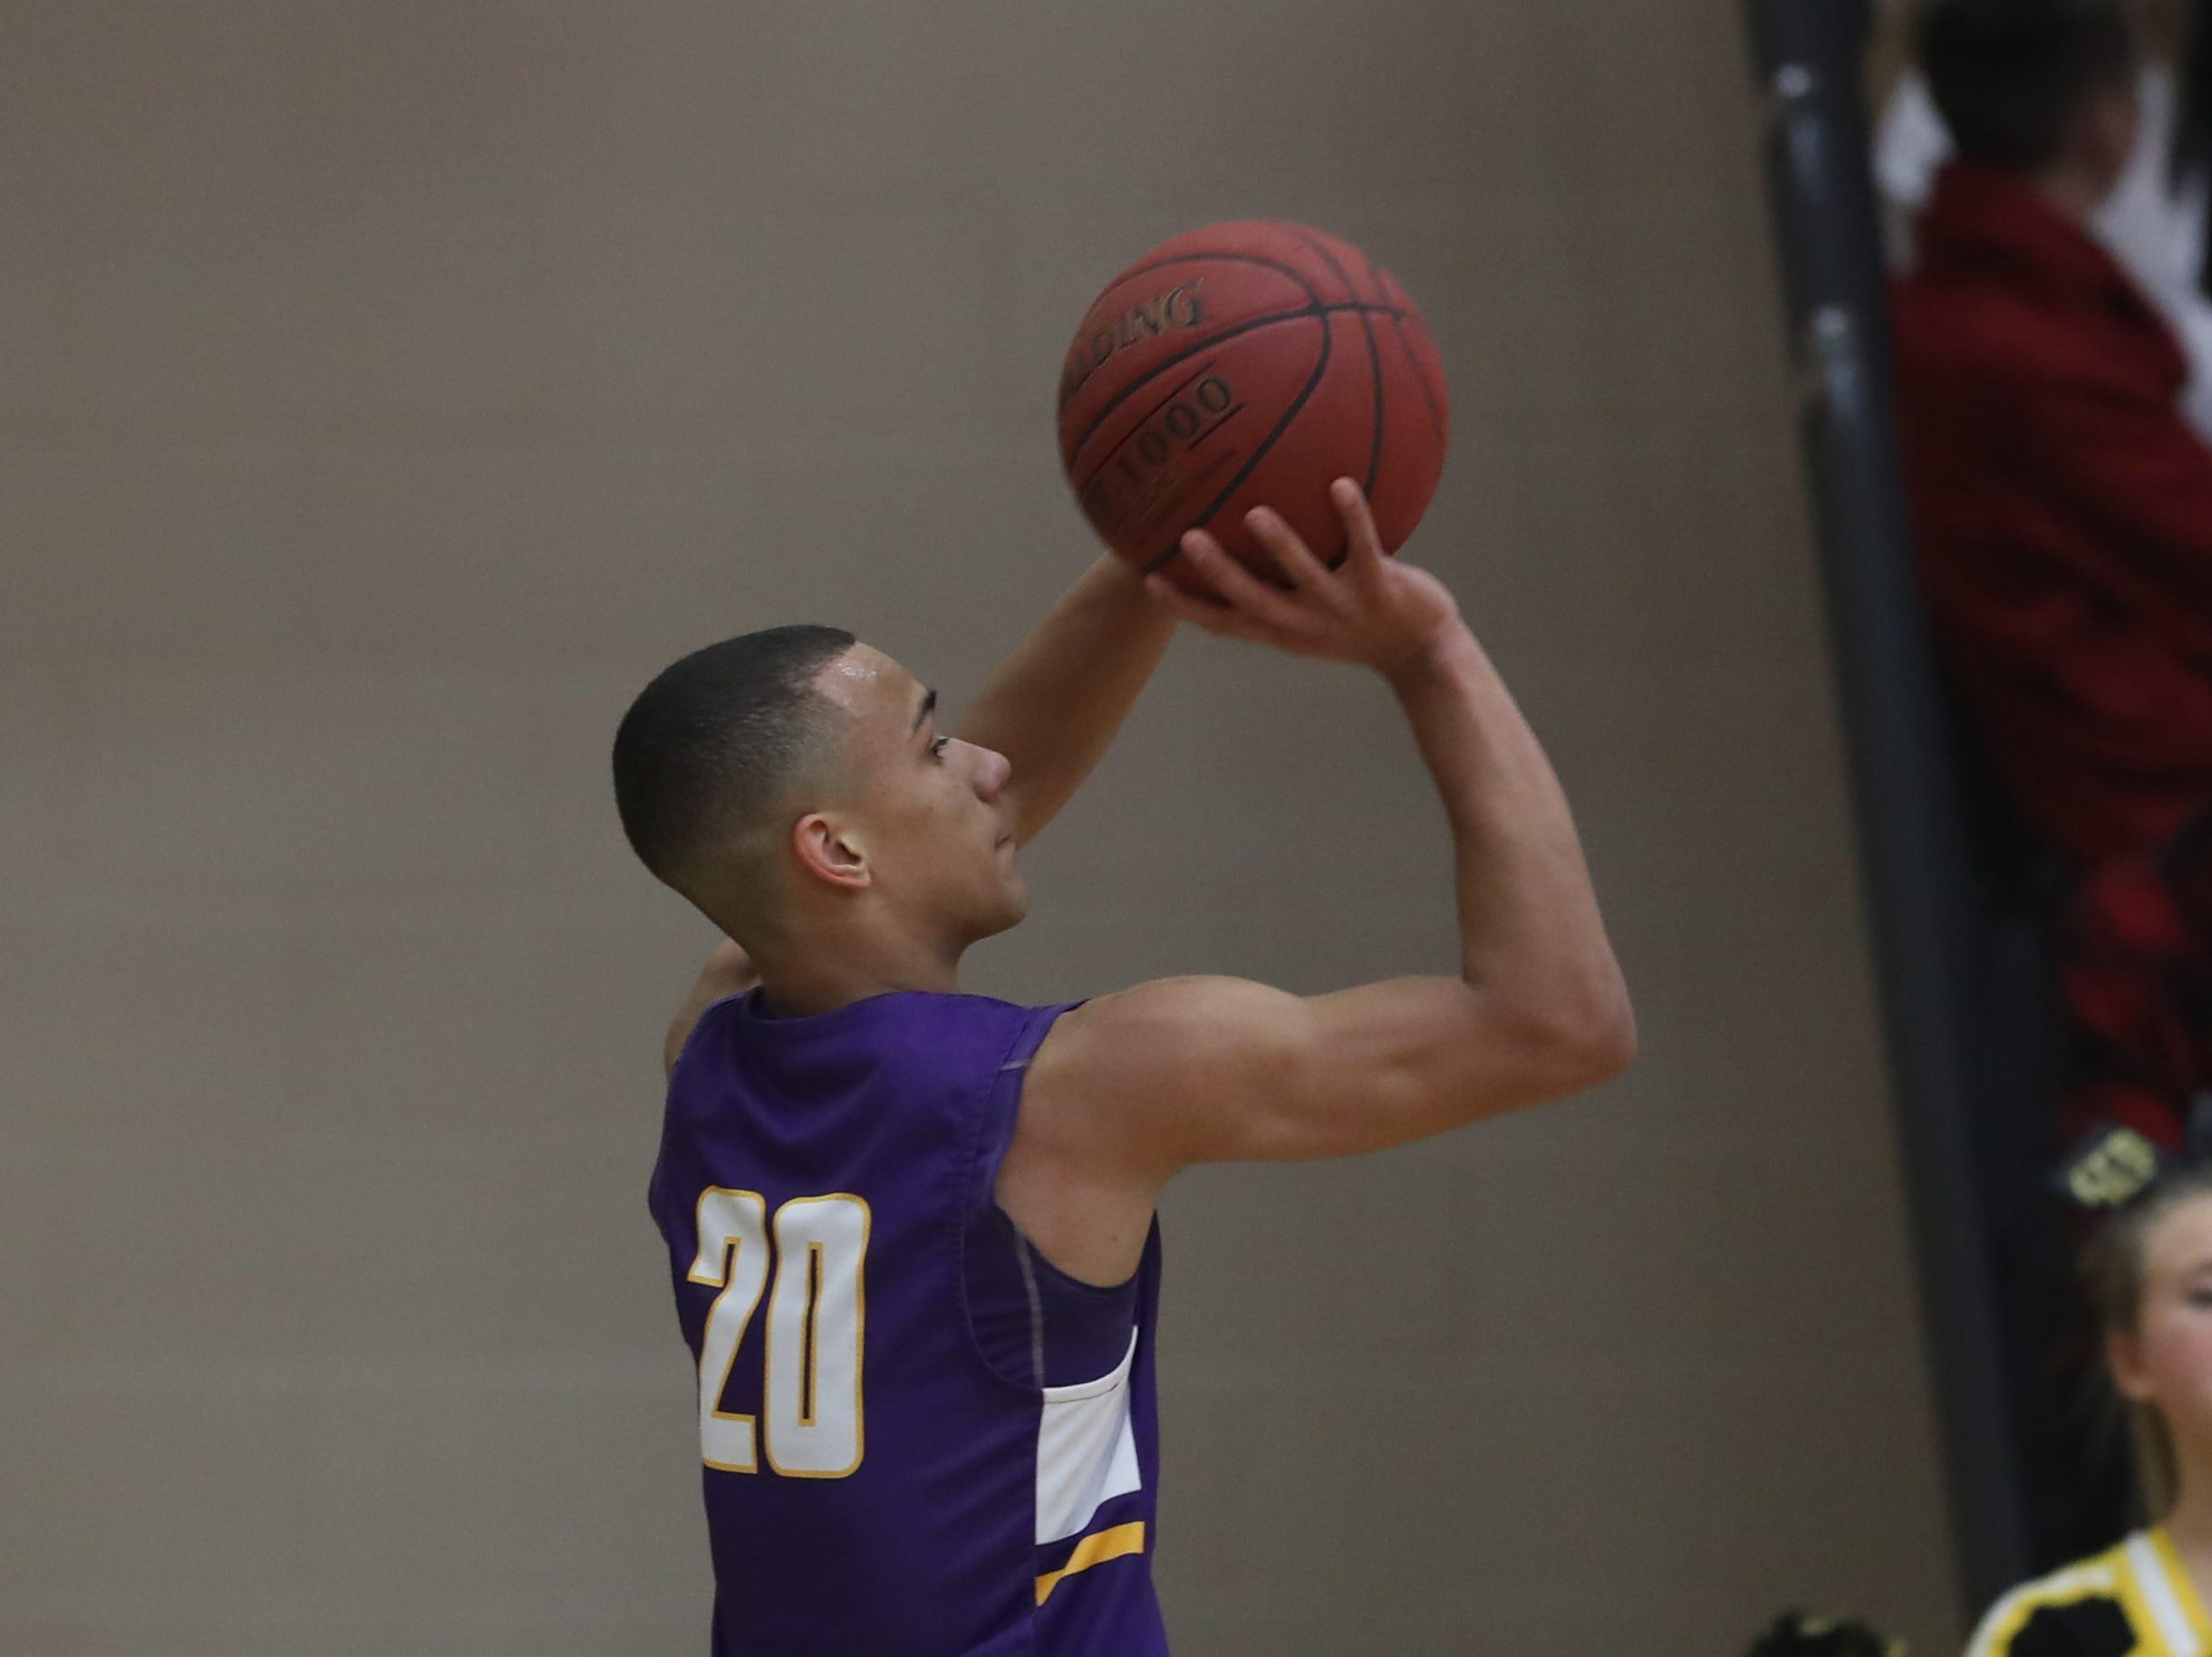 Waukee Warriors' Dante Jenkins (20) shoots against the Southeast Polk Rams during a game on Feb. 1, 2019 at Southeast Polk High School.